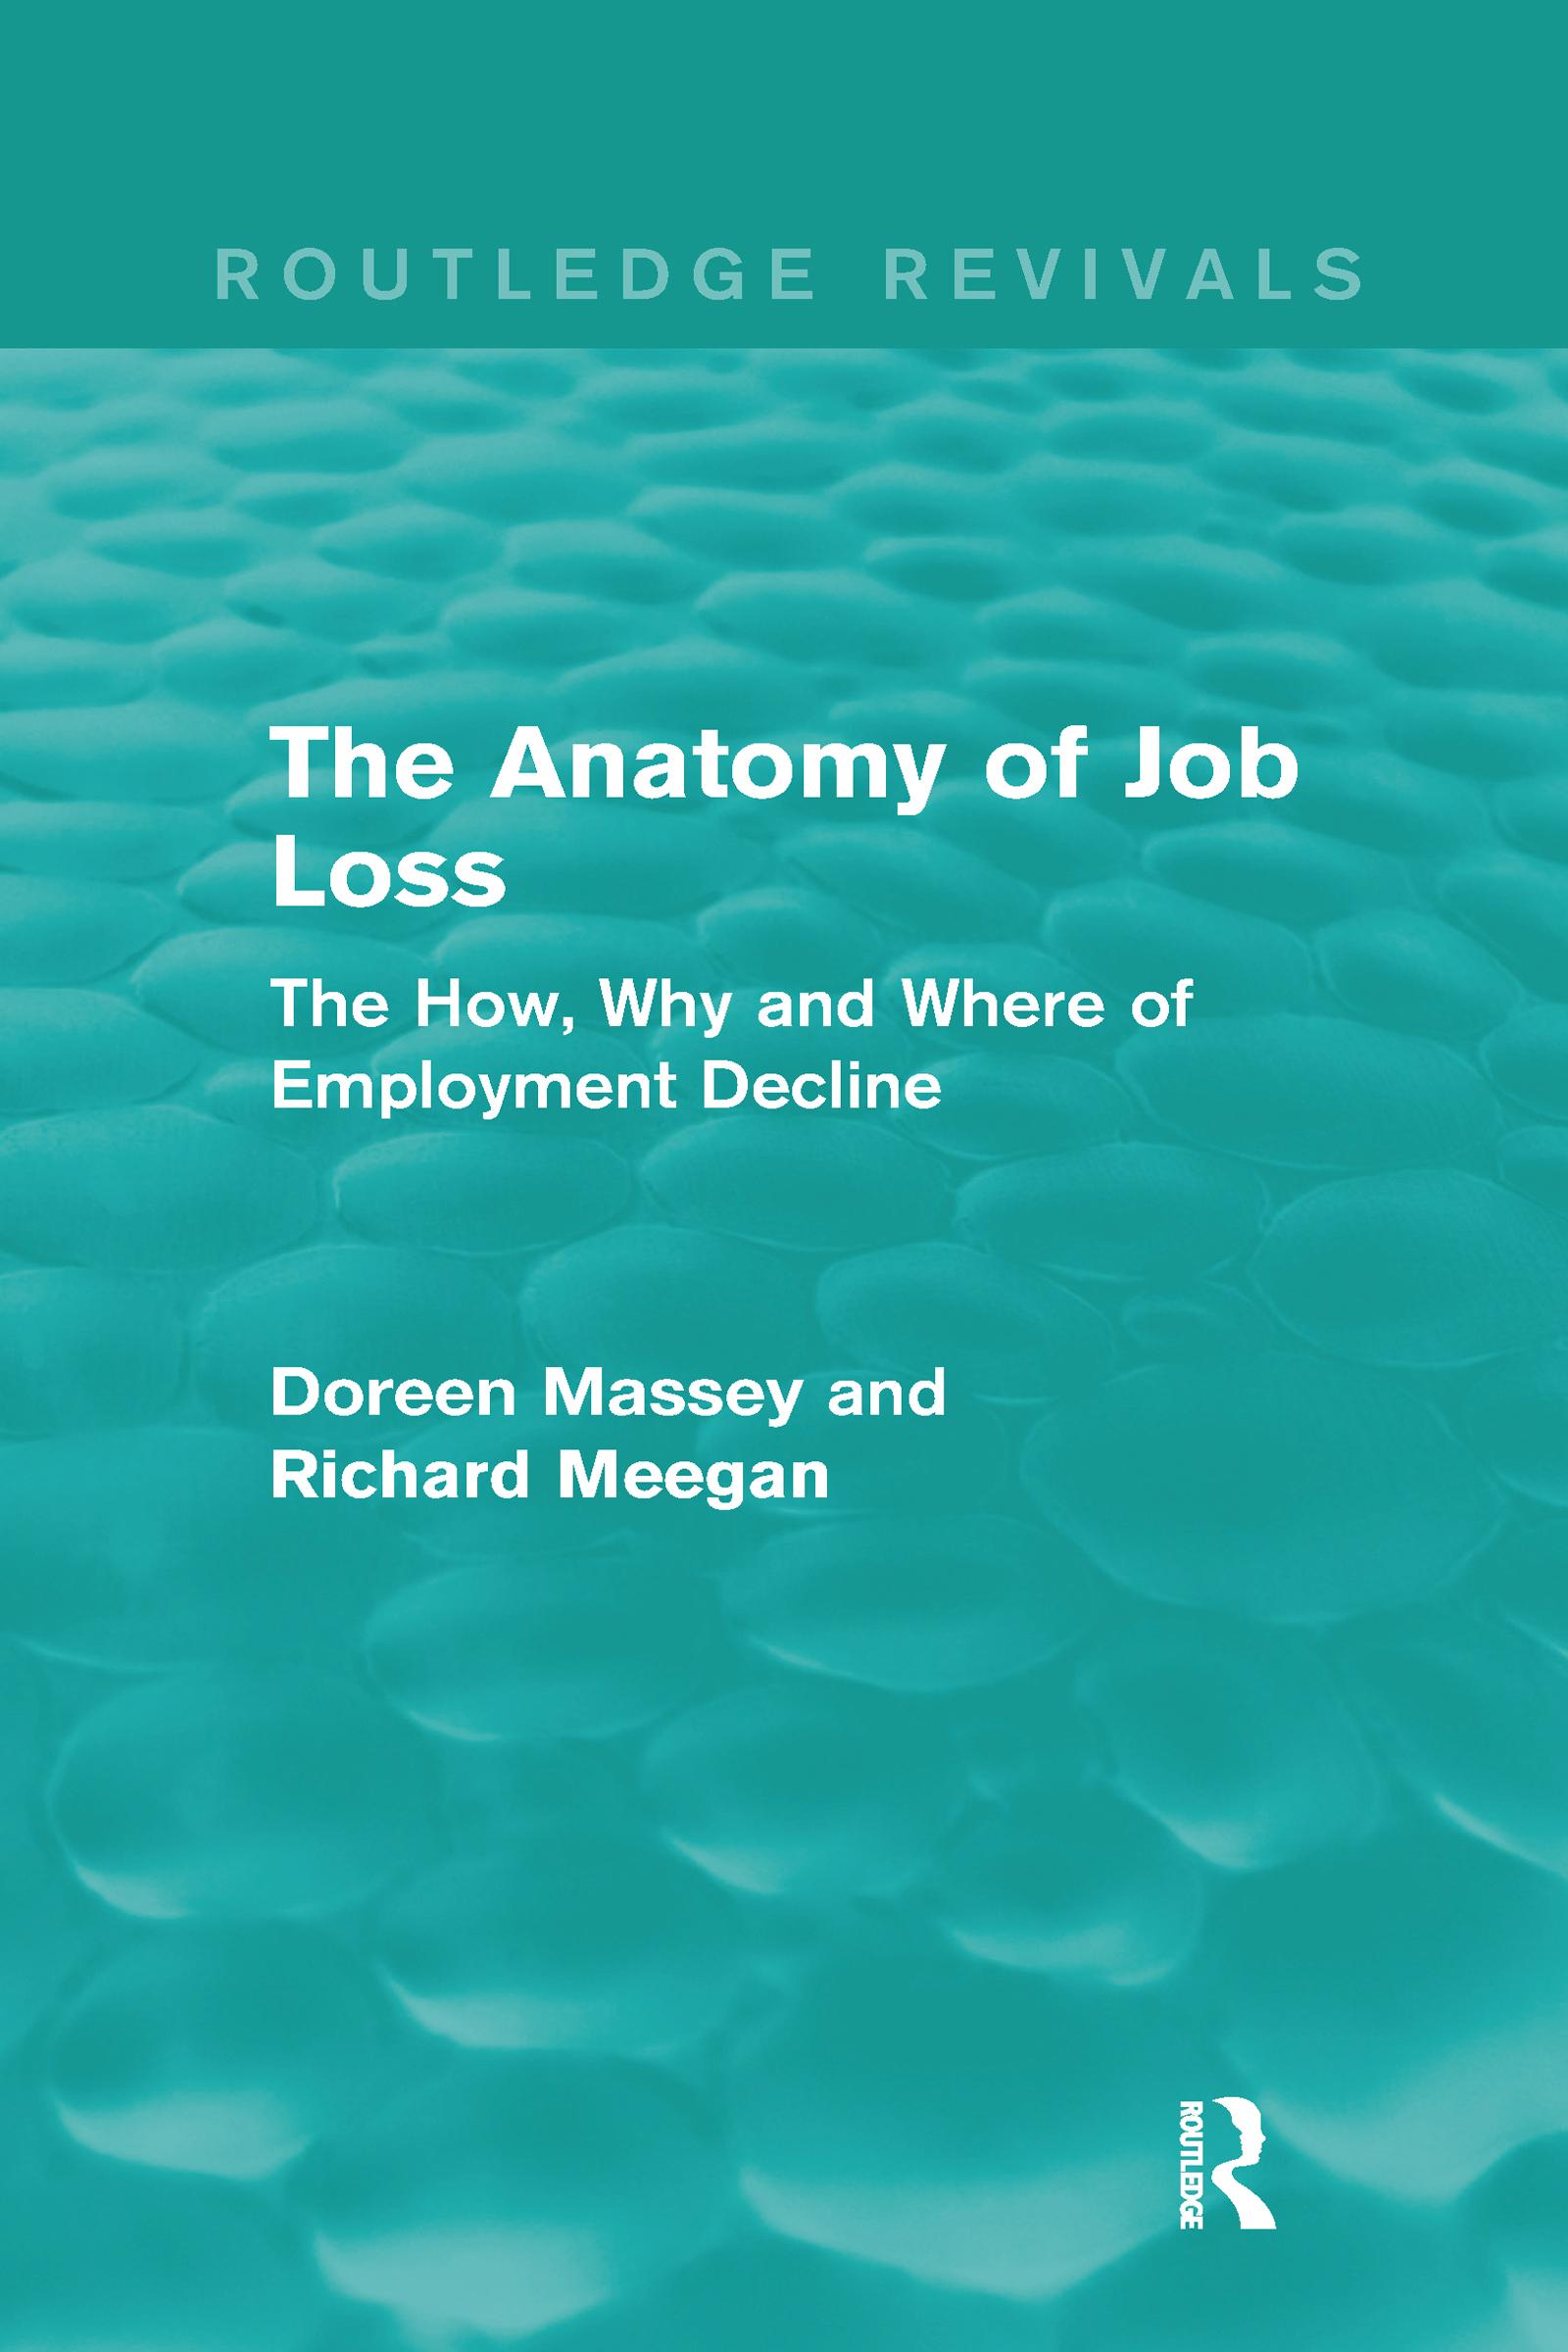 Forms of production reorganization and job loss